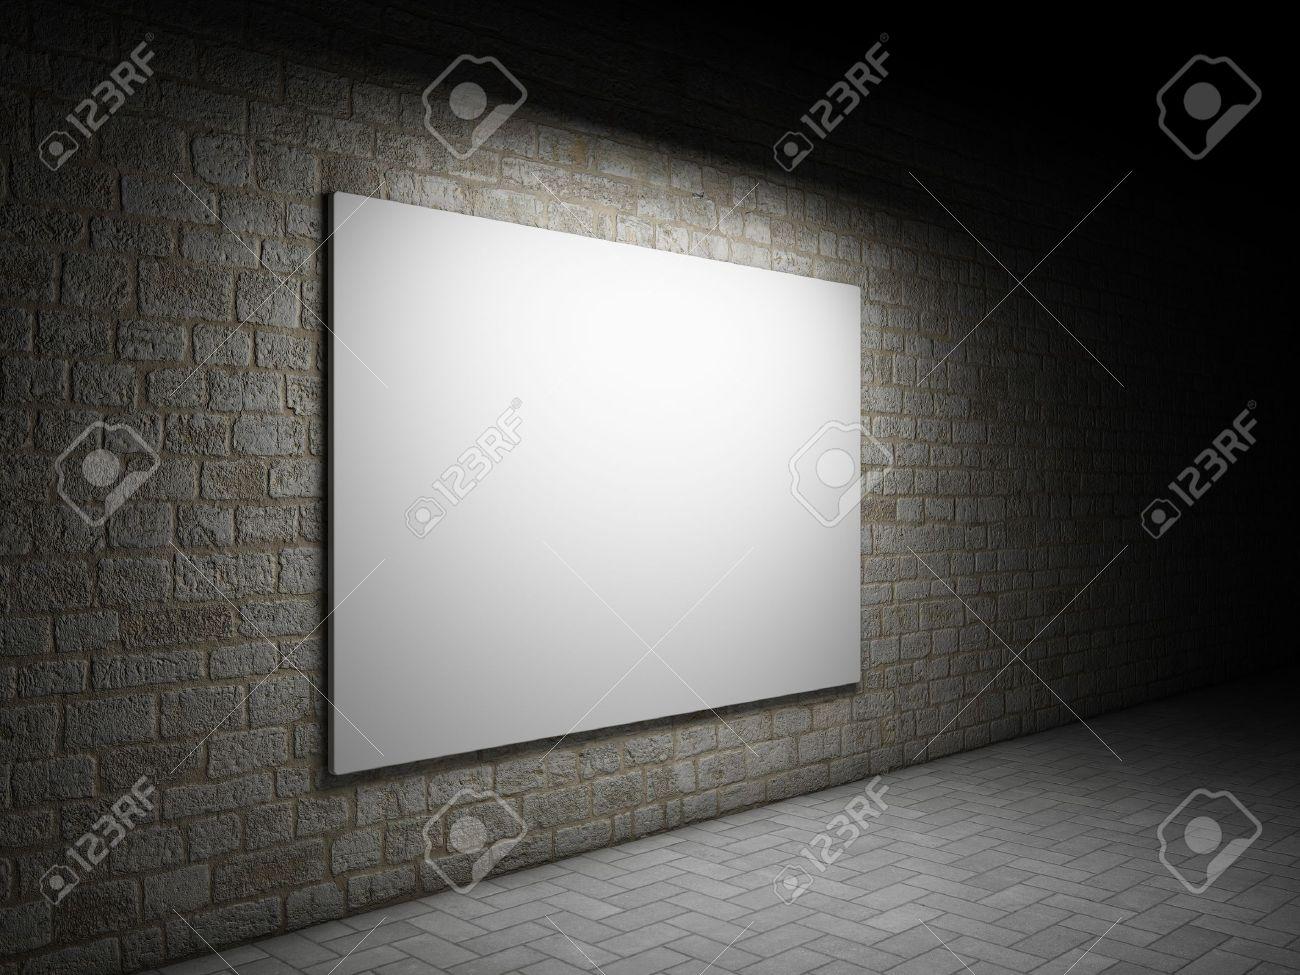 Blank advertising billboard on a brick wall at night Stock Photo - 12878915